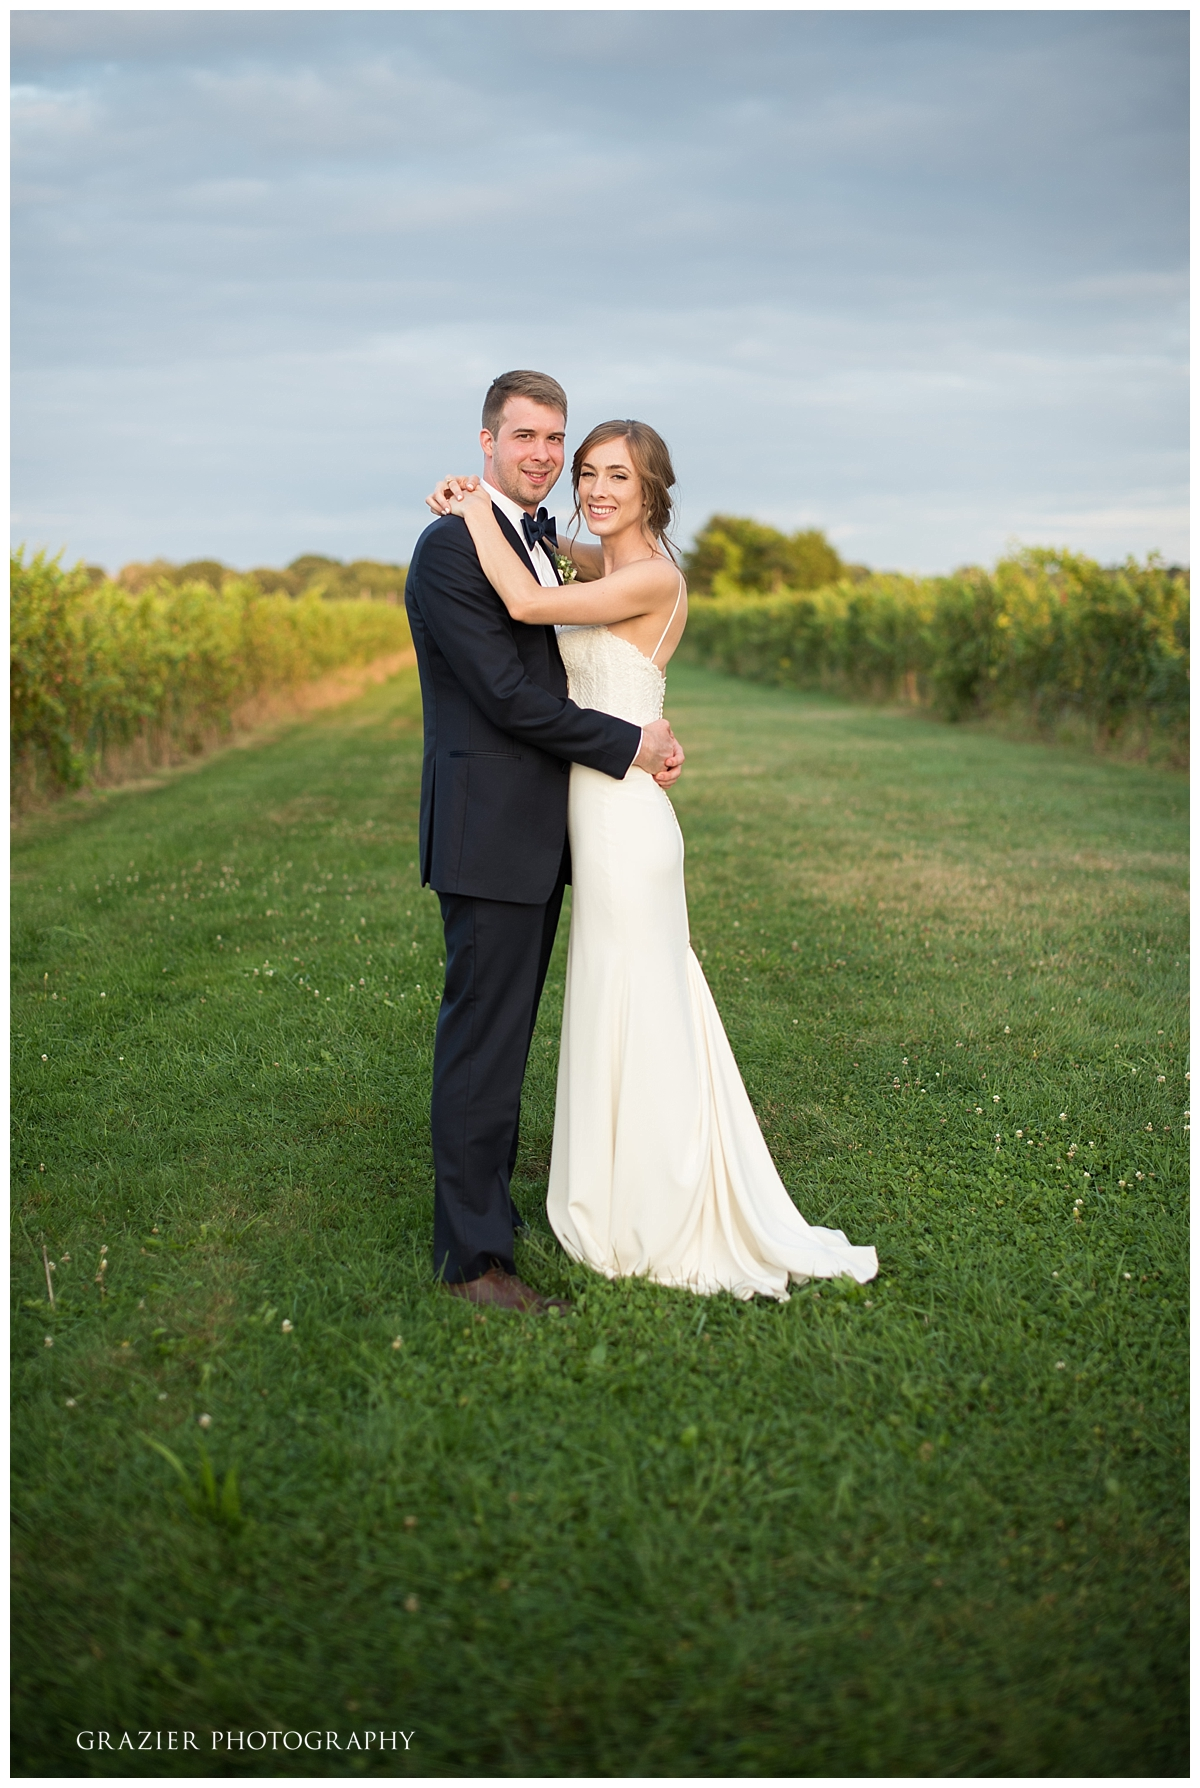 Saltwater Farm Vineyard Wedding Grazier Photography 170825-80_WEB.jpg